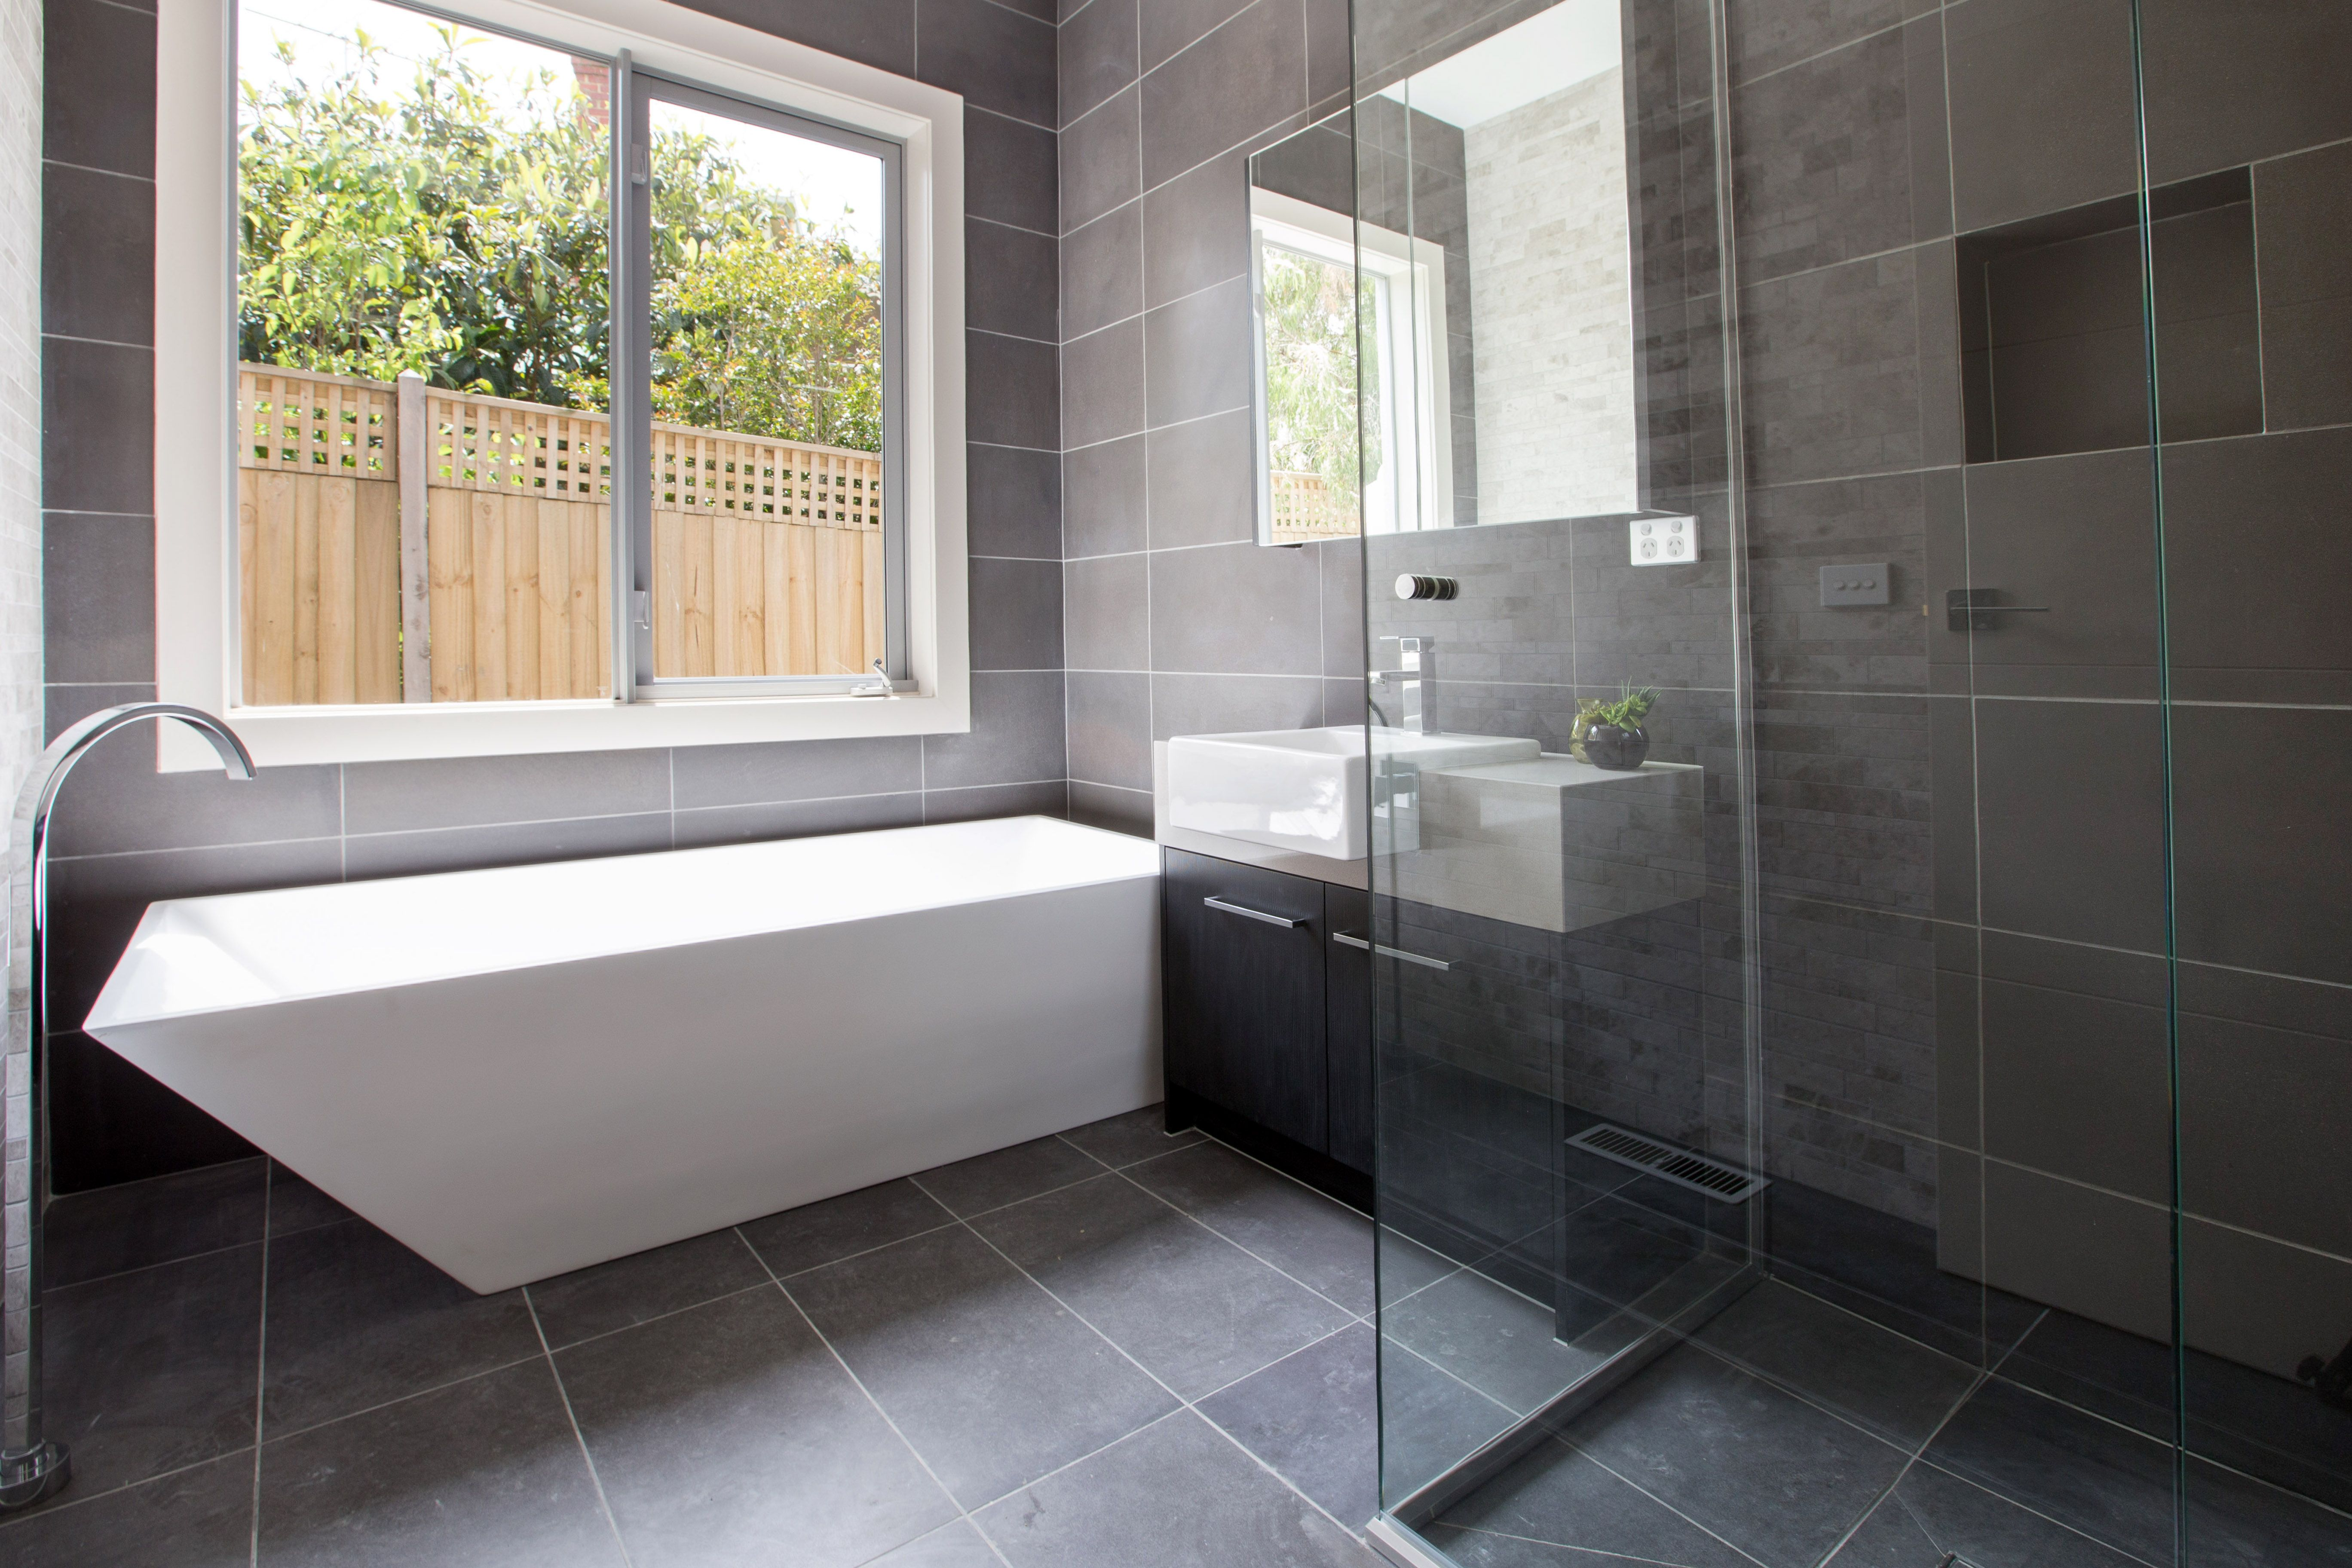 1 mln bathroom tile ideas shower tiles pinterest bathroom 1 mln bathroom tile ideas dailygadgetfo Choice Image